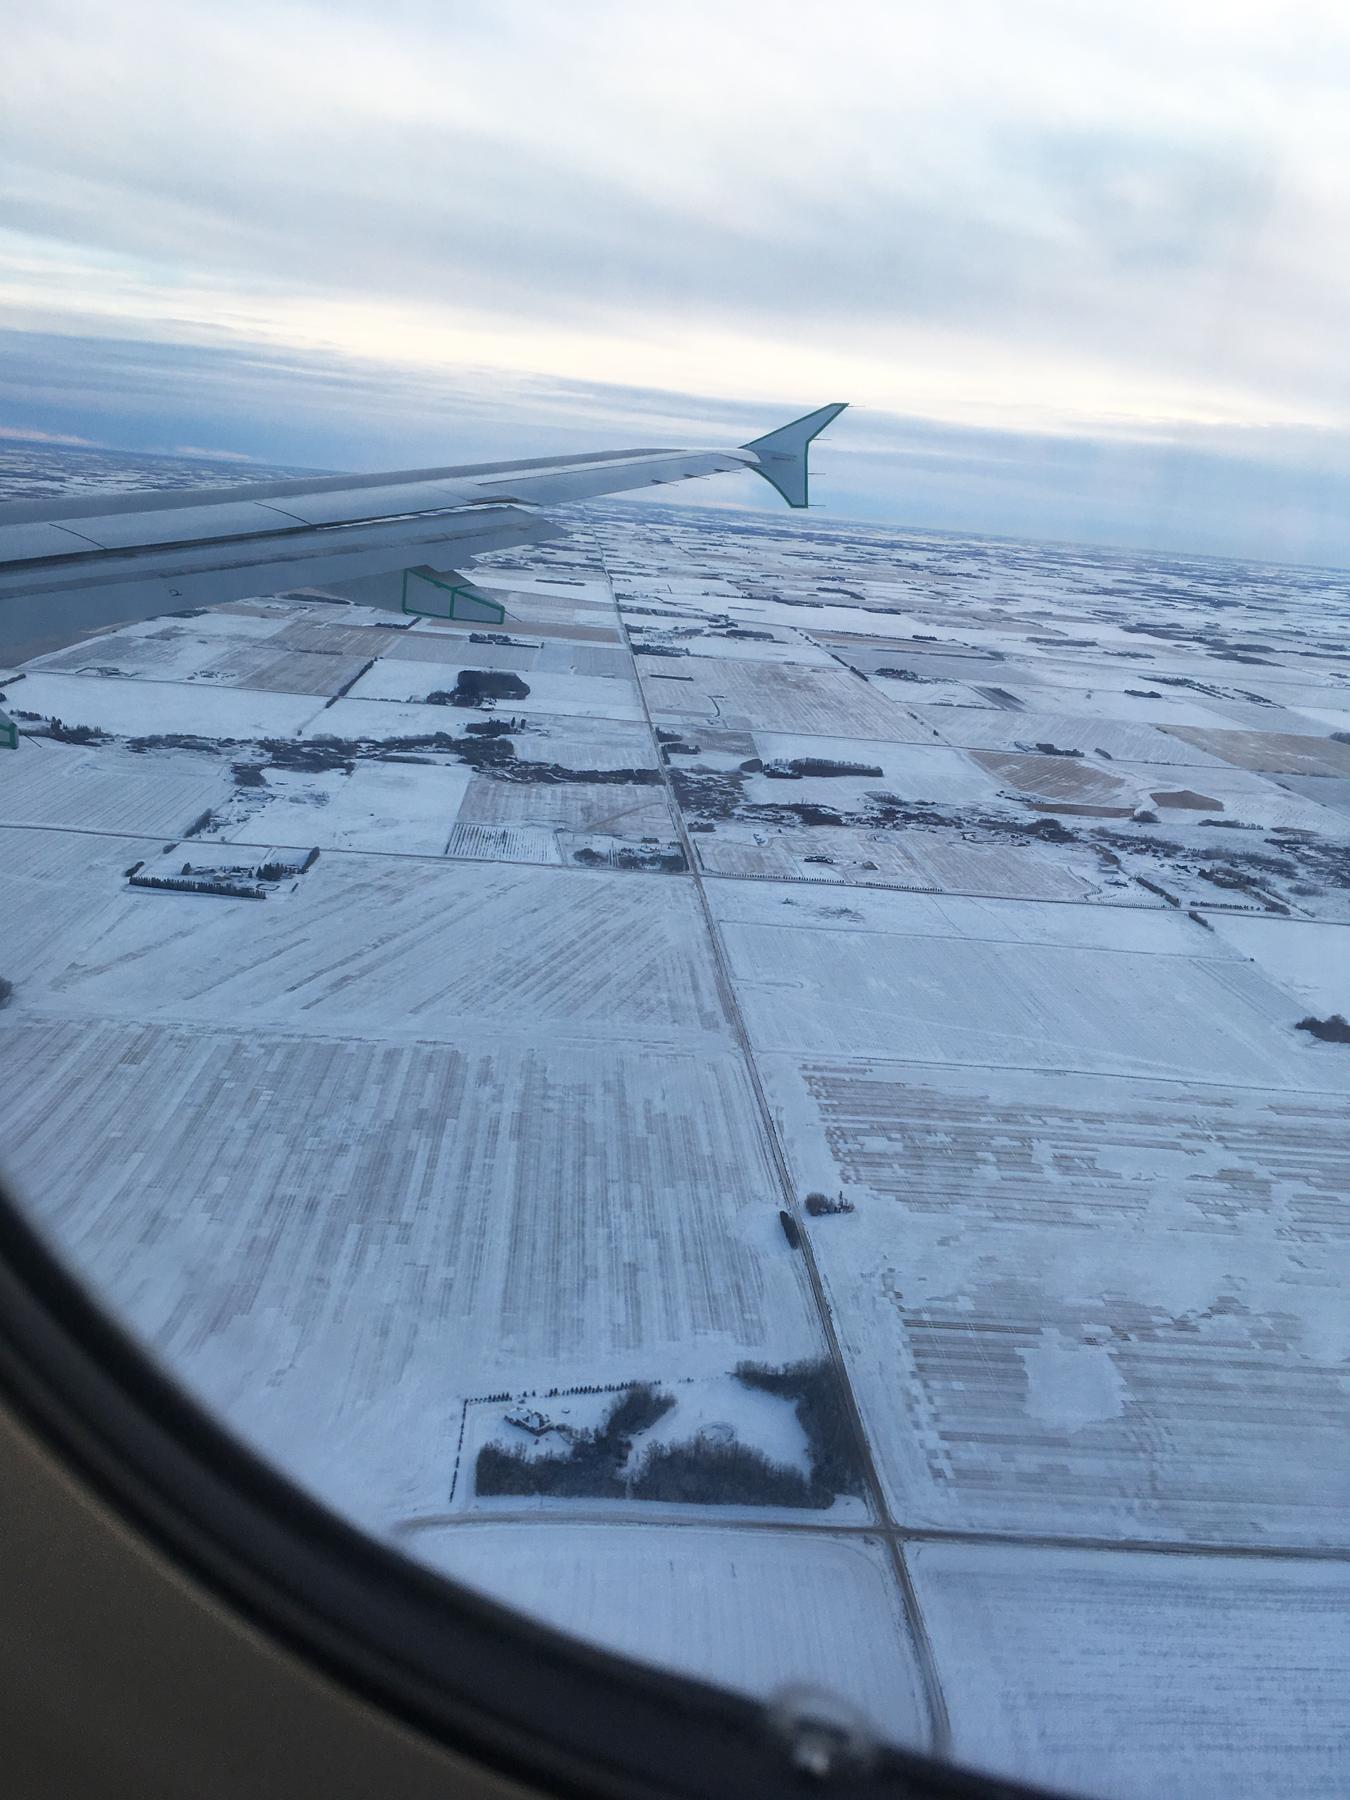 Back in Canada!